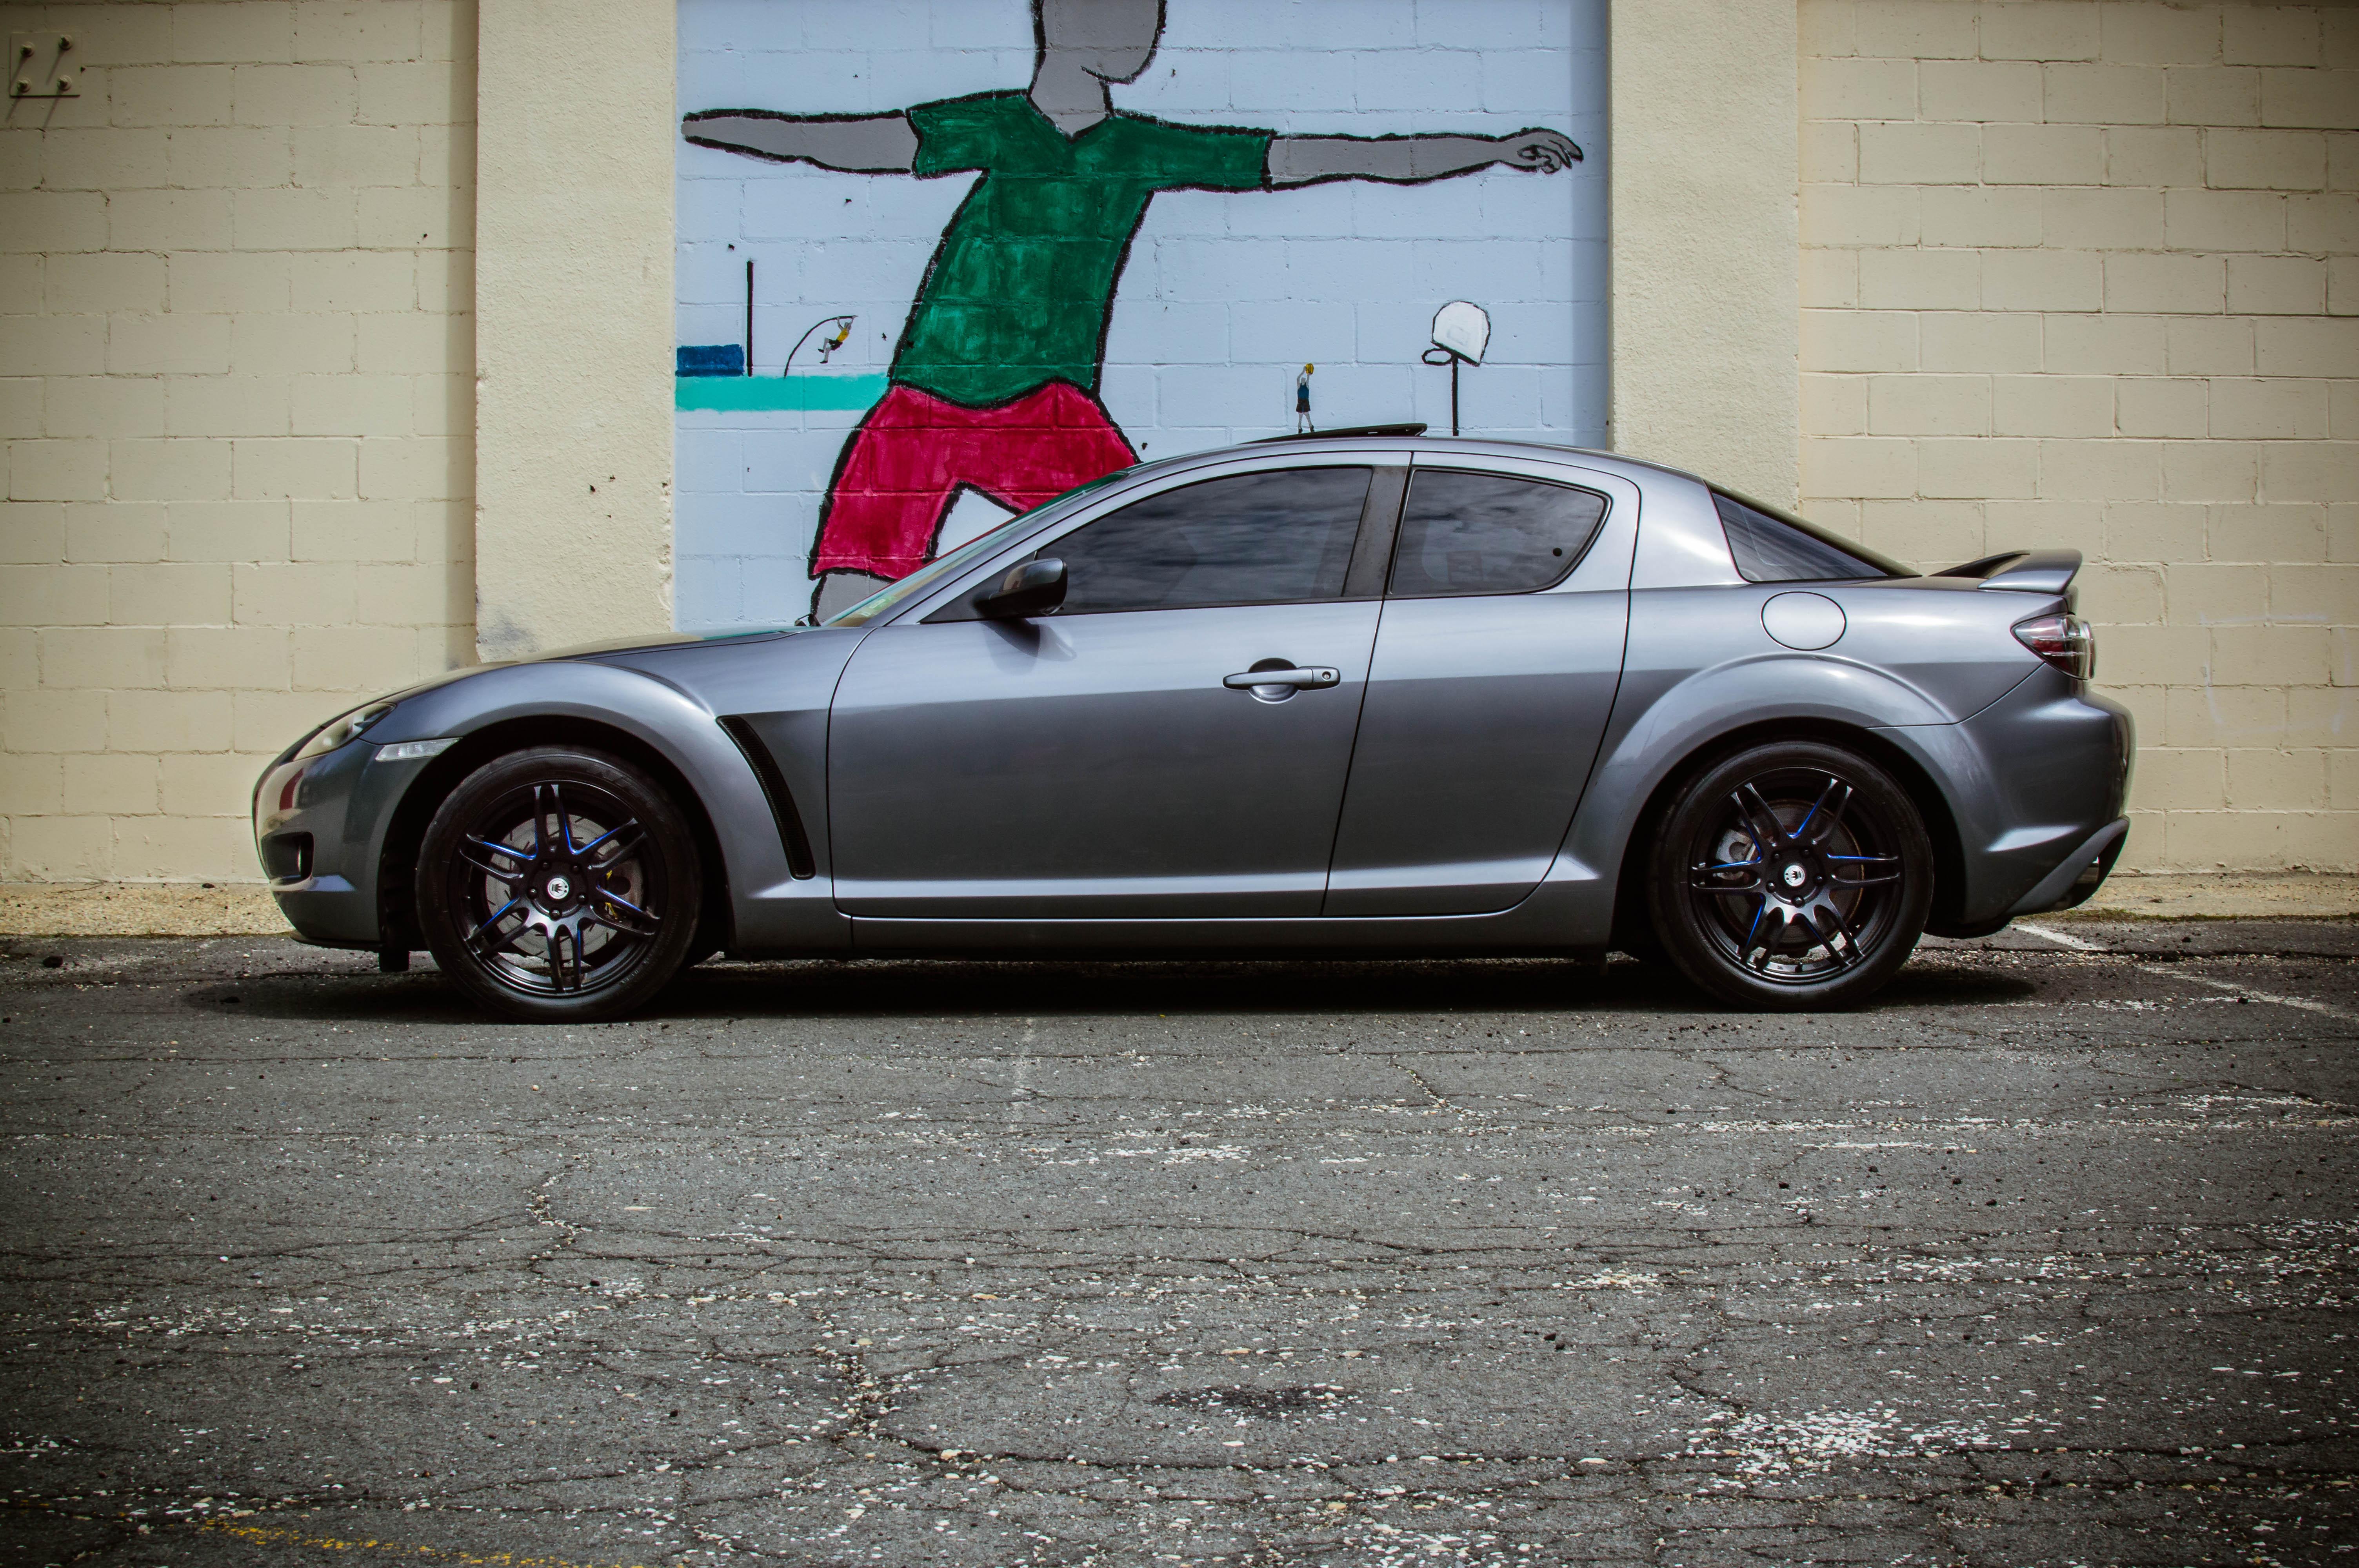 Wallpaper Black Street Road Hood Door Graffiti Wheels